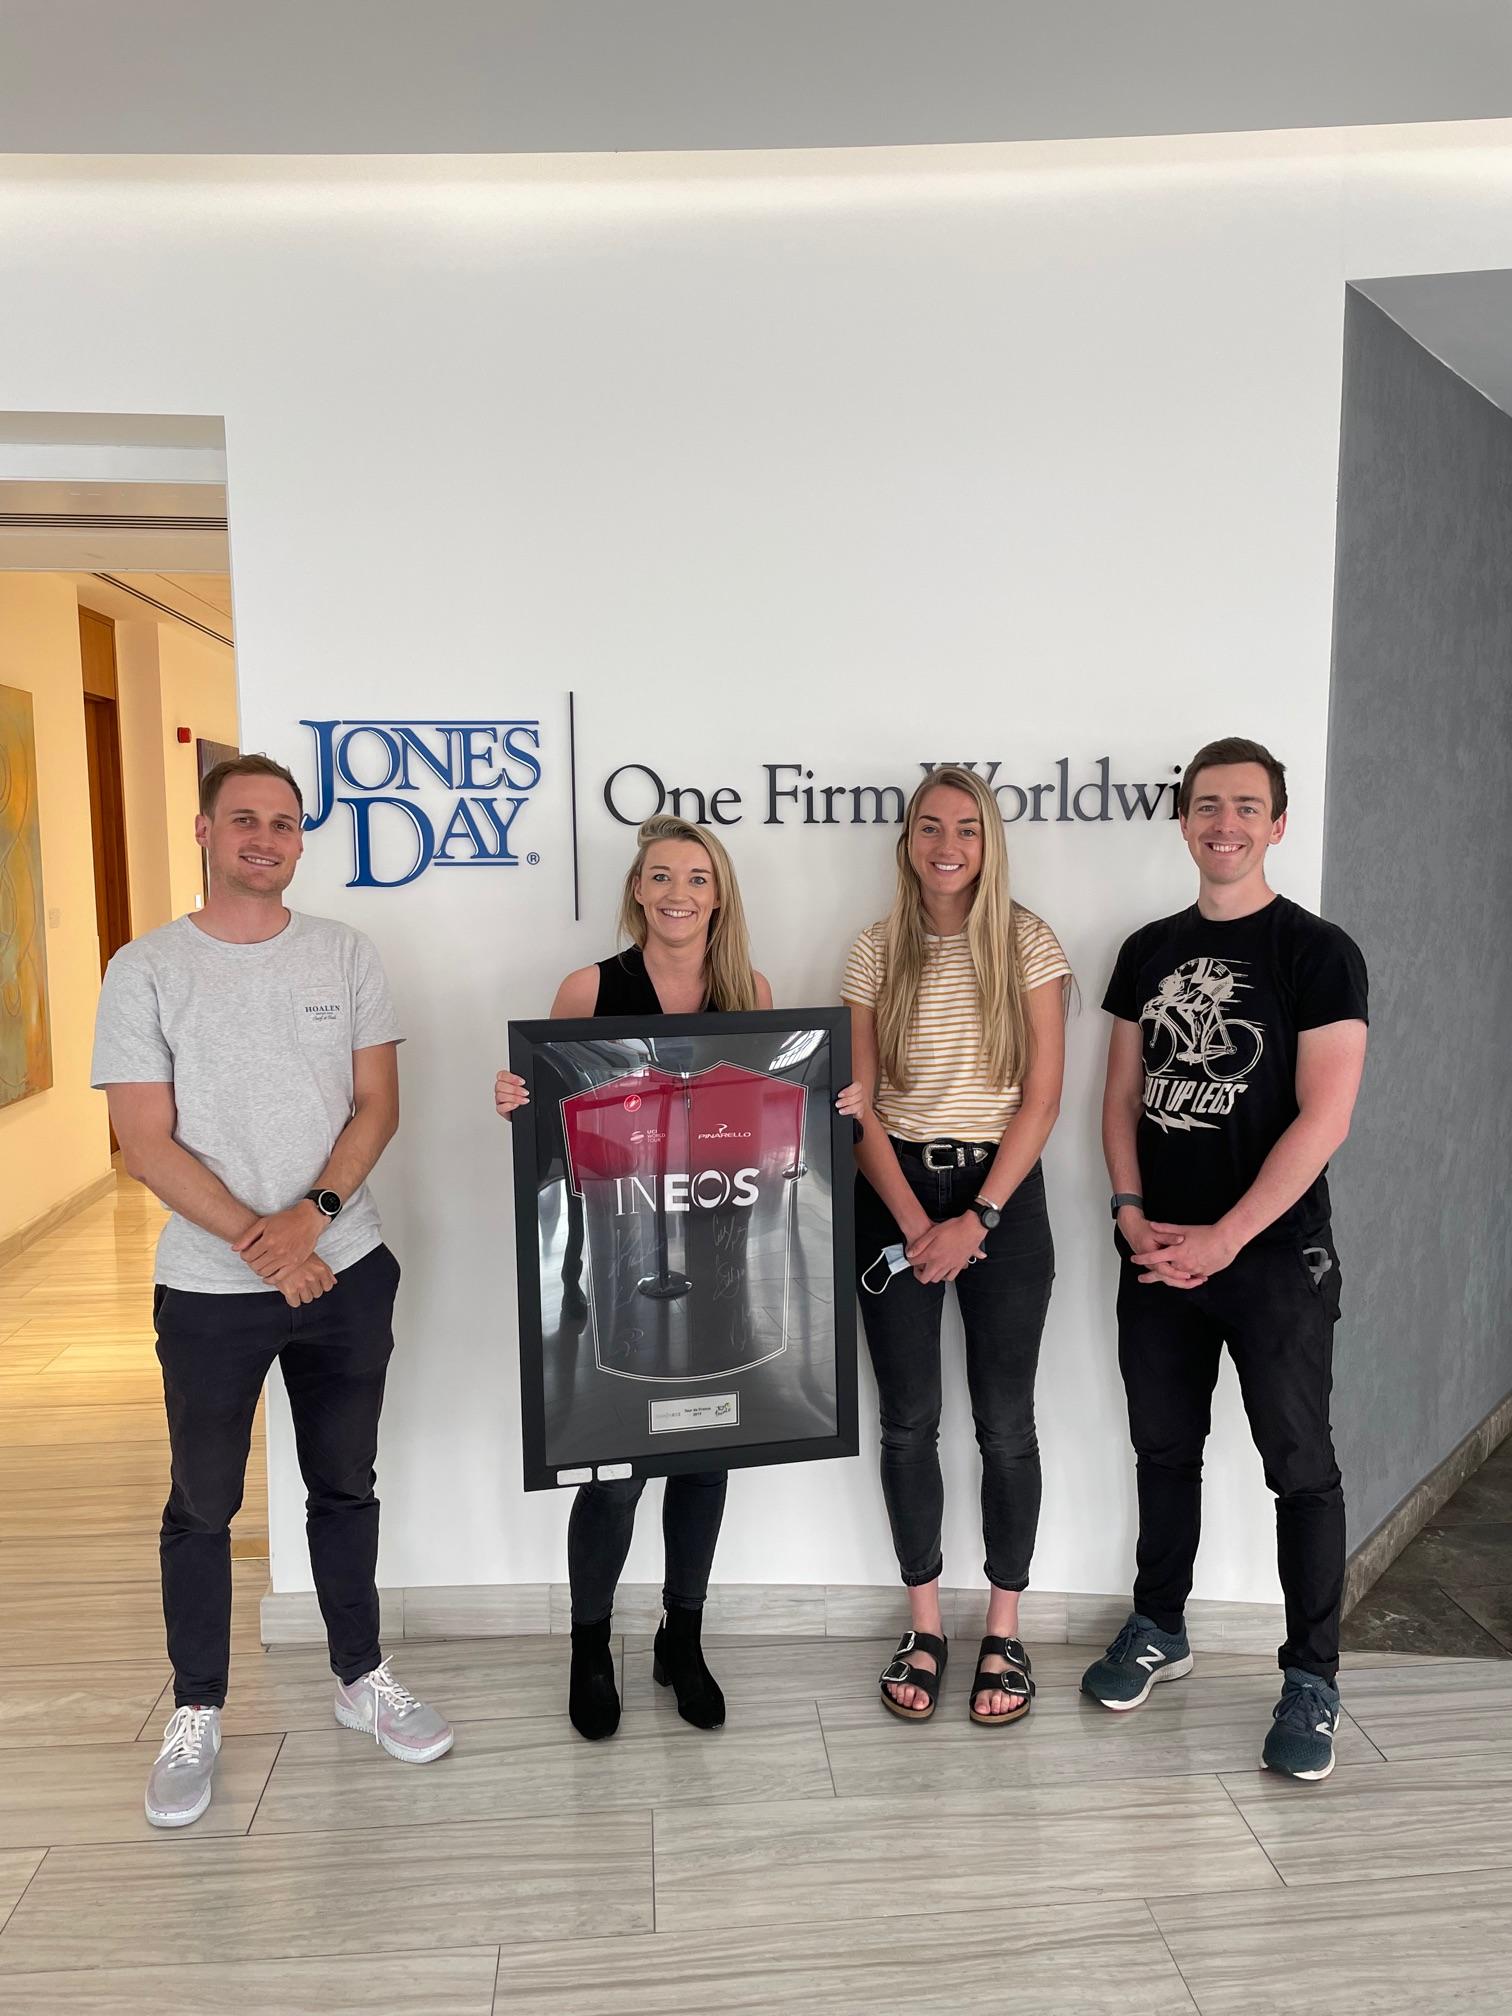 Image of jones day winners